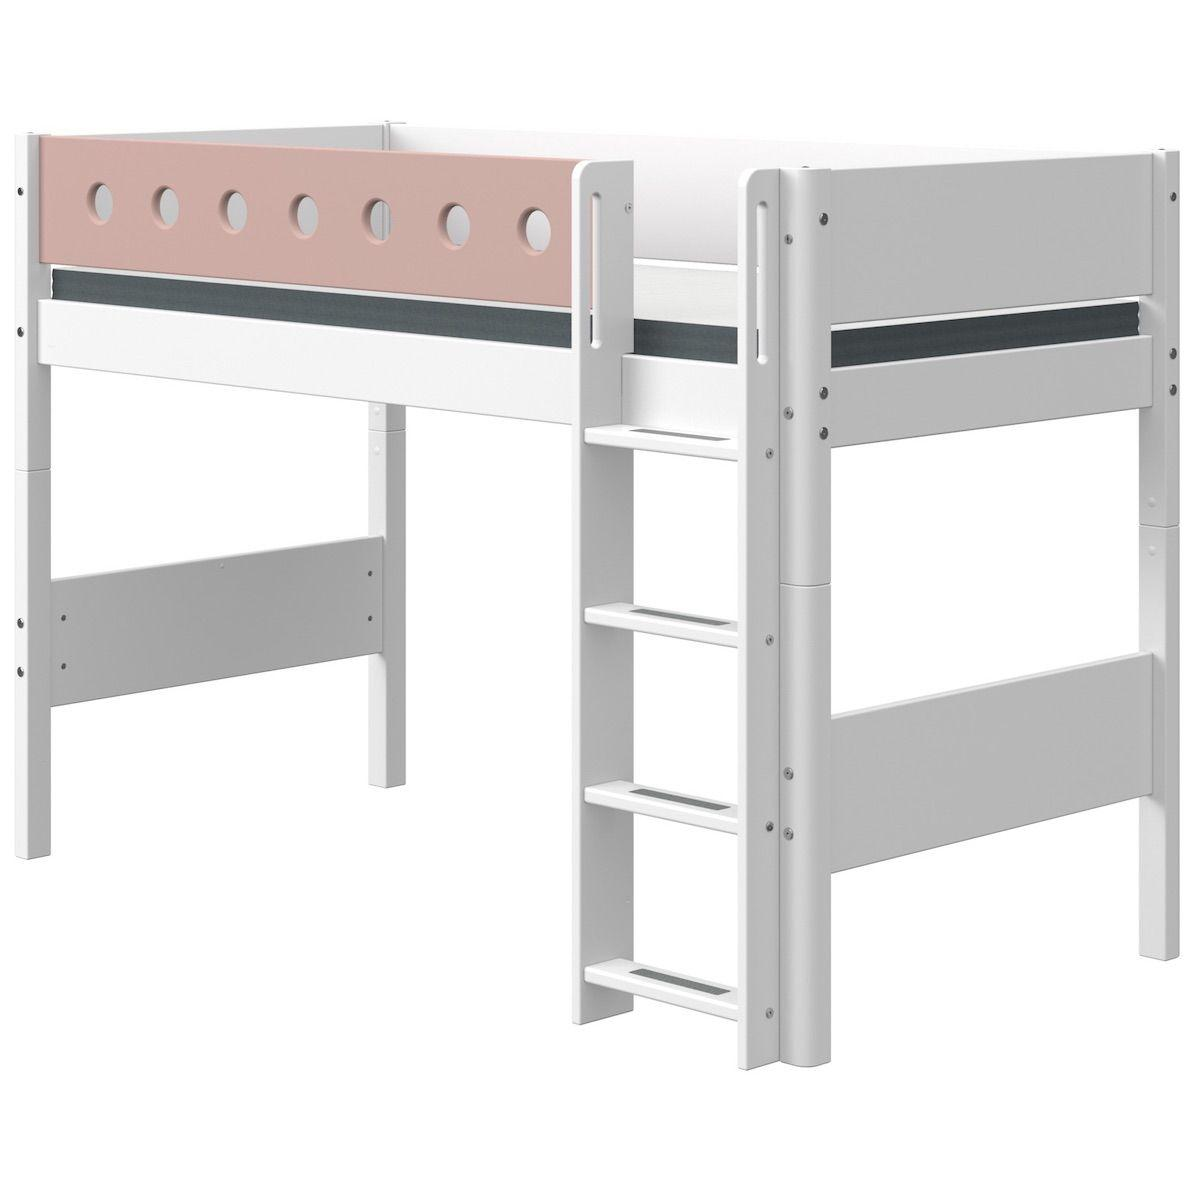 Cama semi-alta 90x200cm escalera recta WHITE Flexa blanco-rosa claro